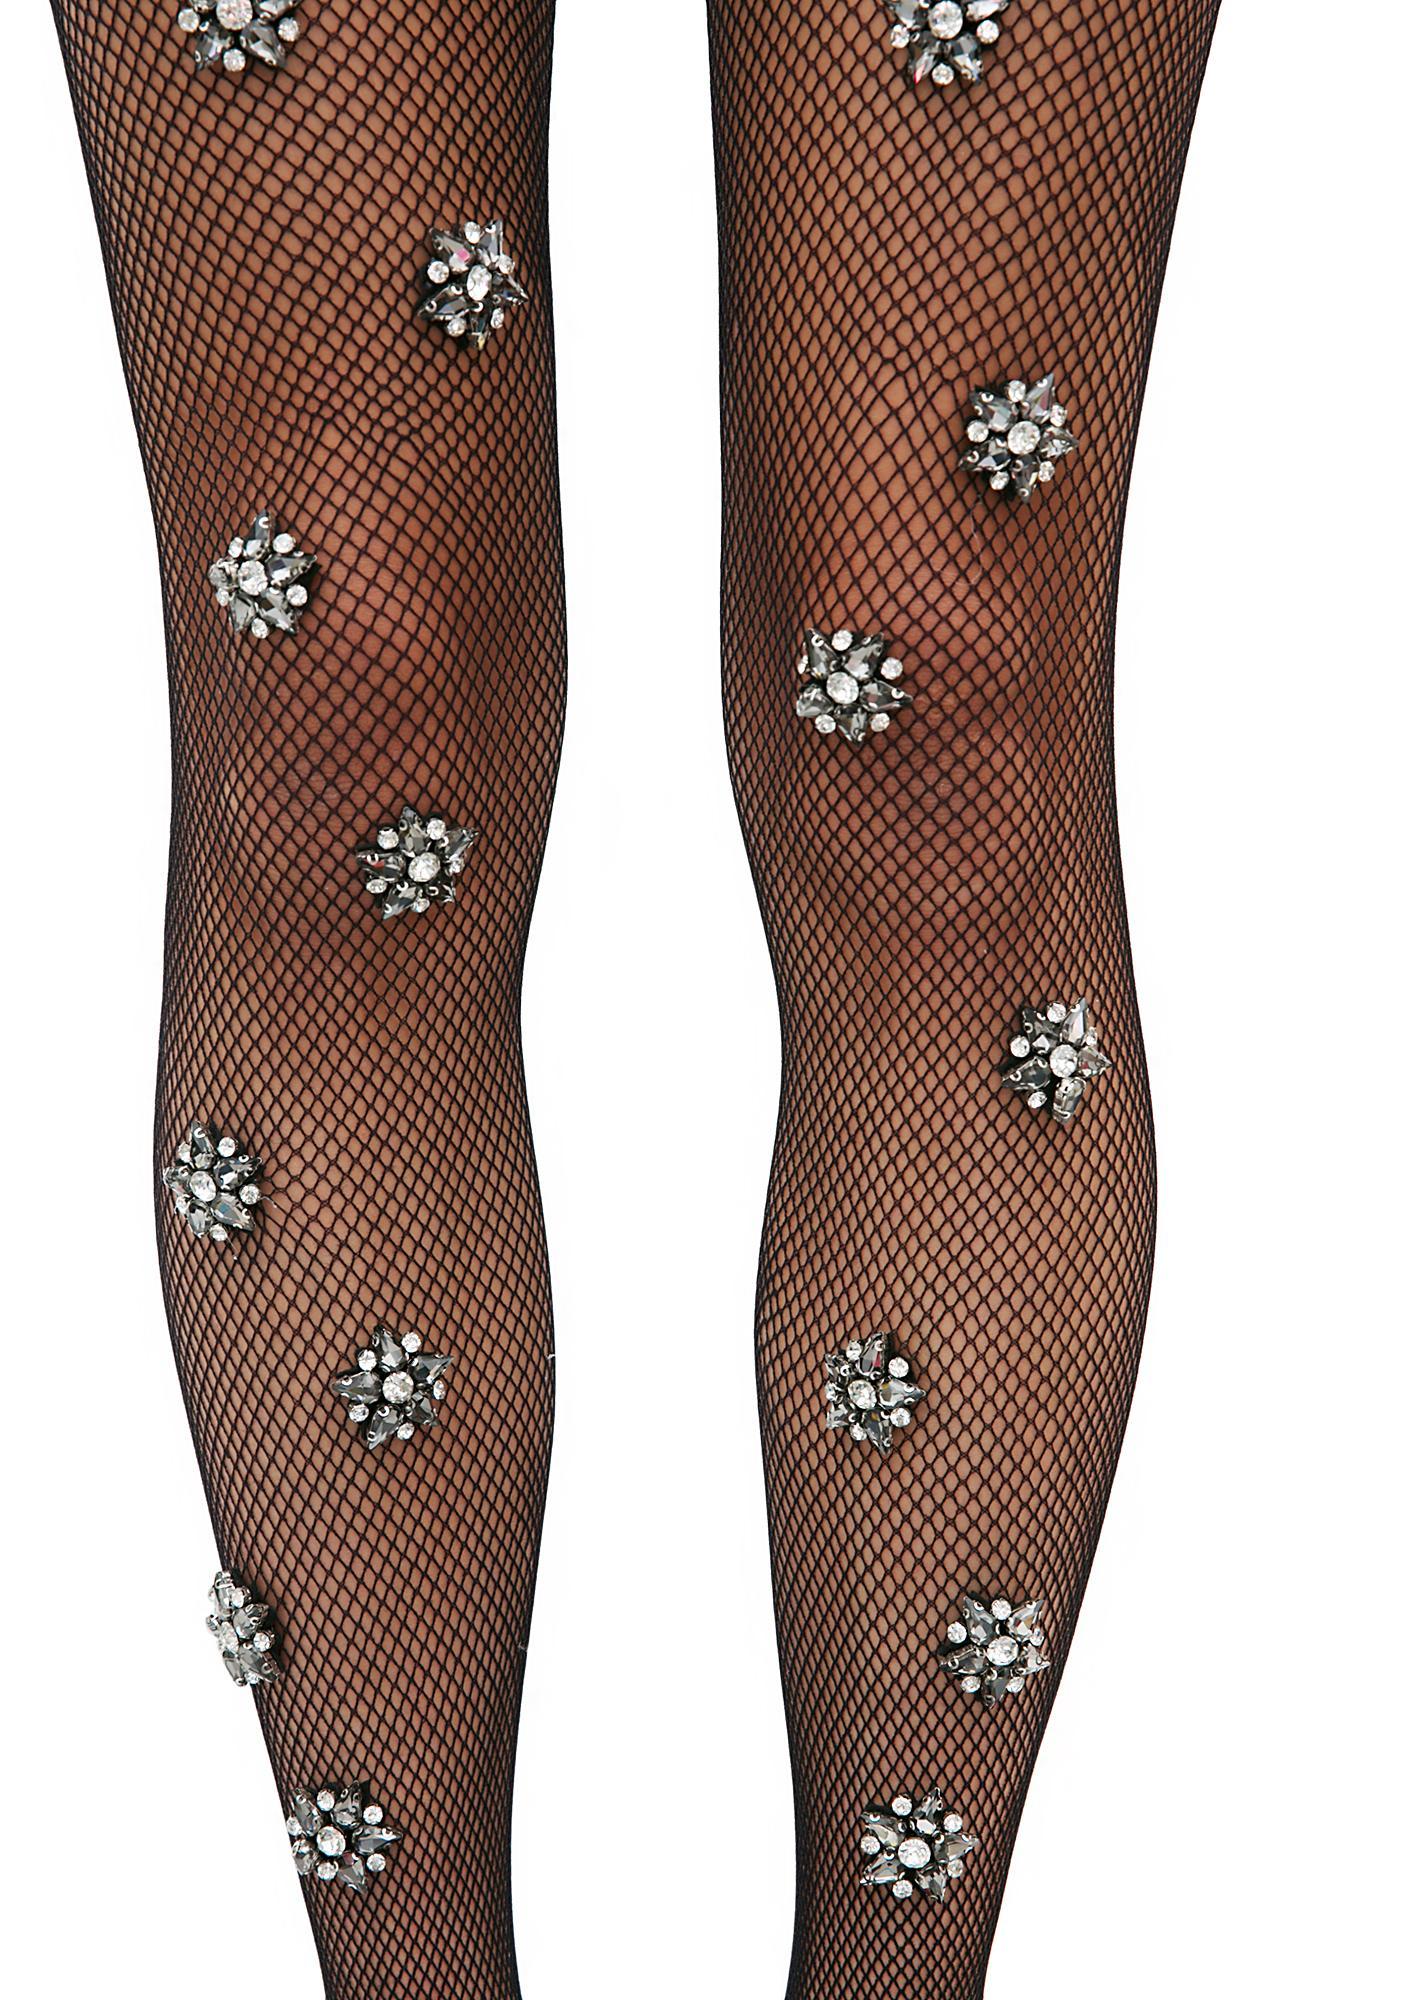 Lirika Matoshi Mystical Being Crystal Fishnet Stockings